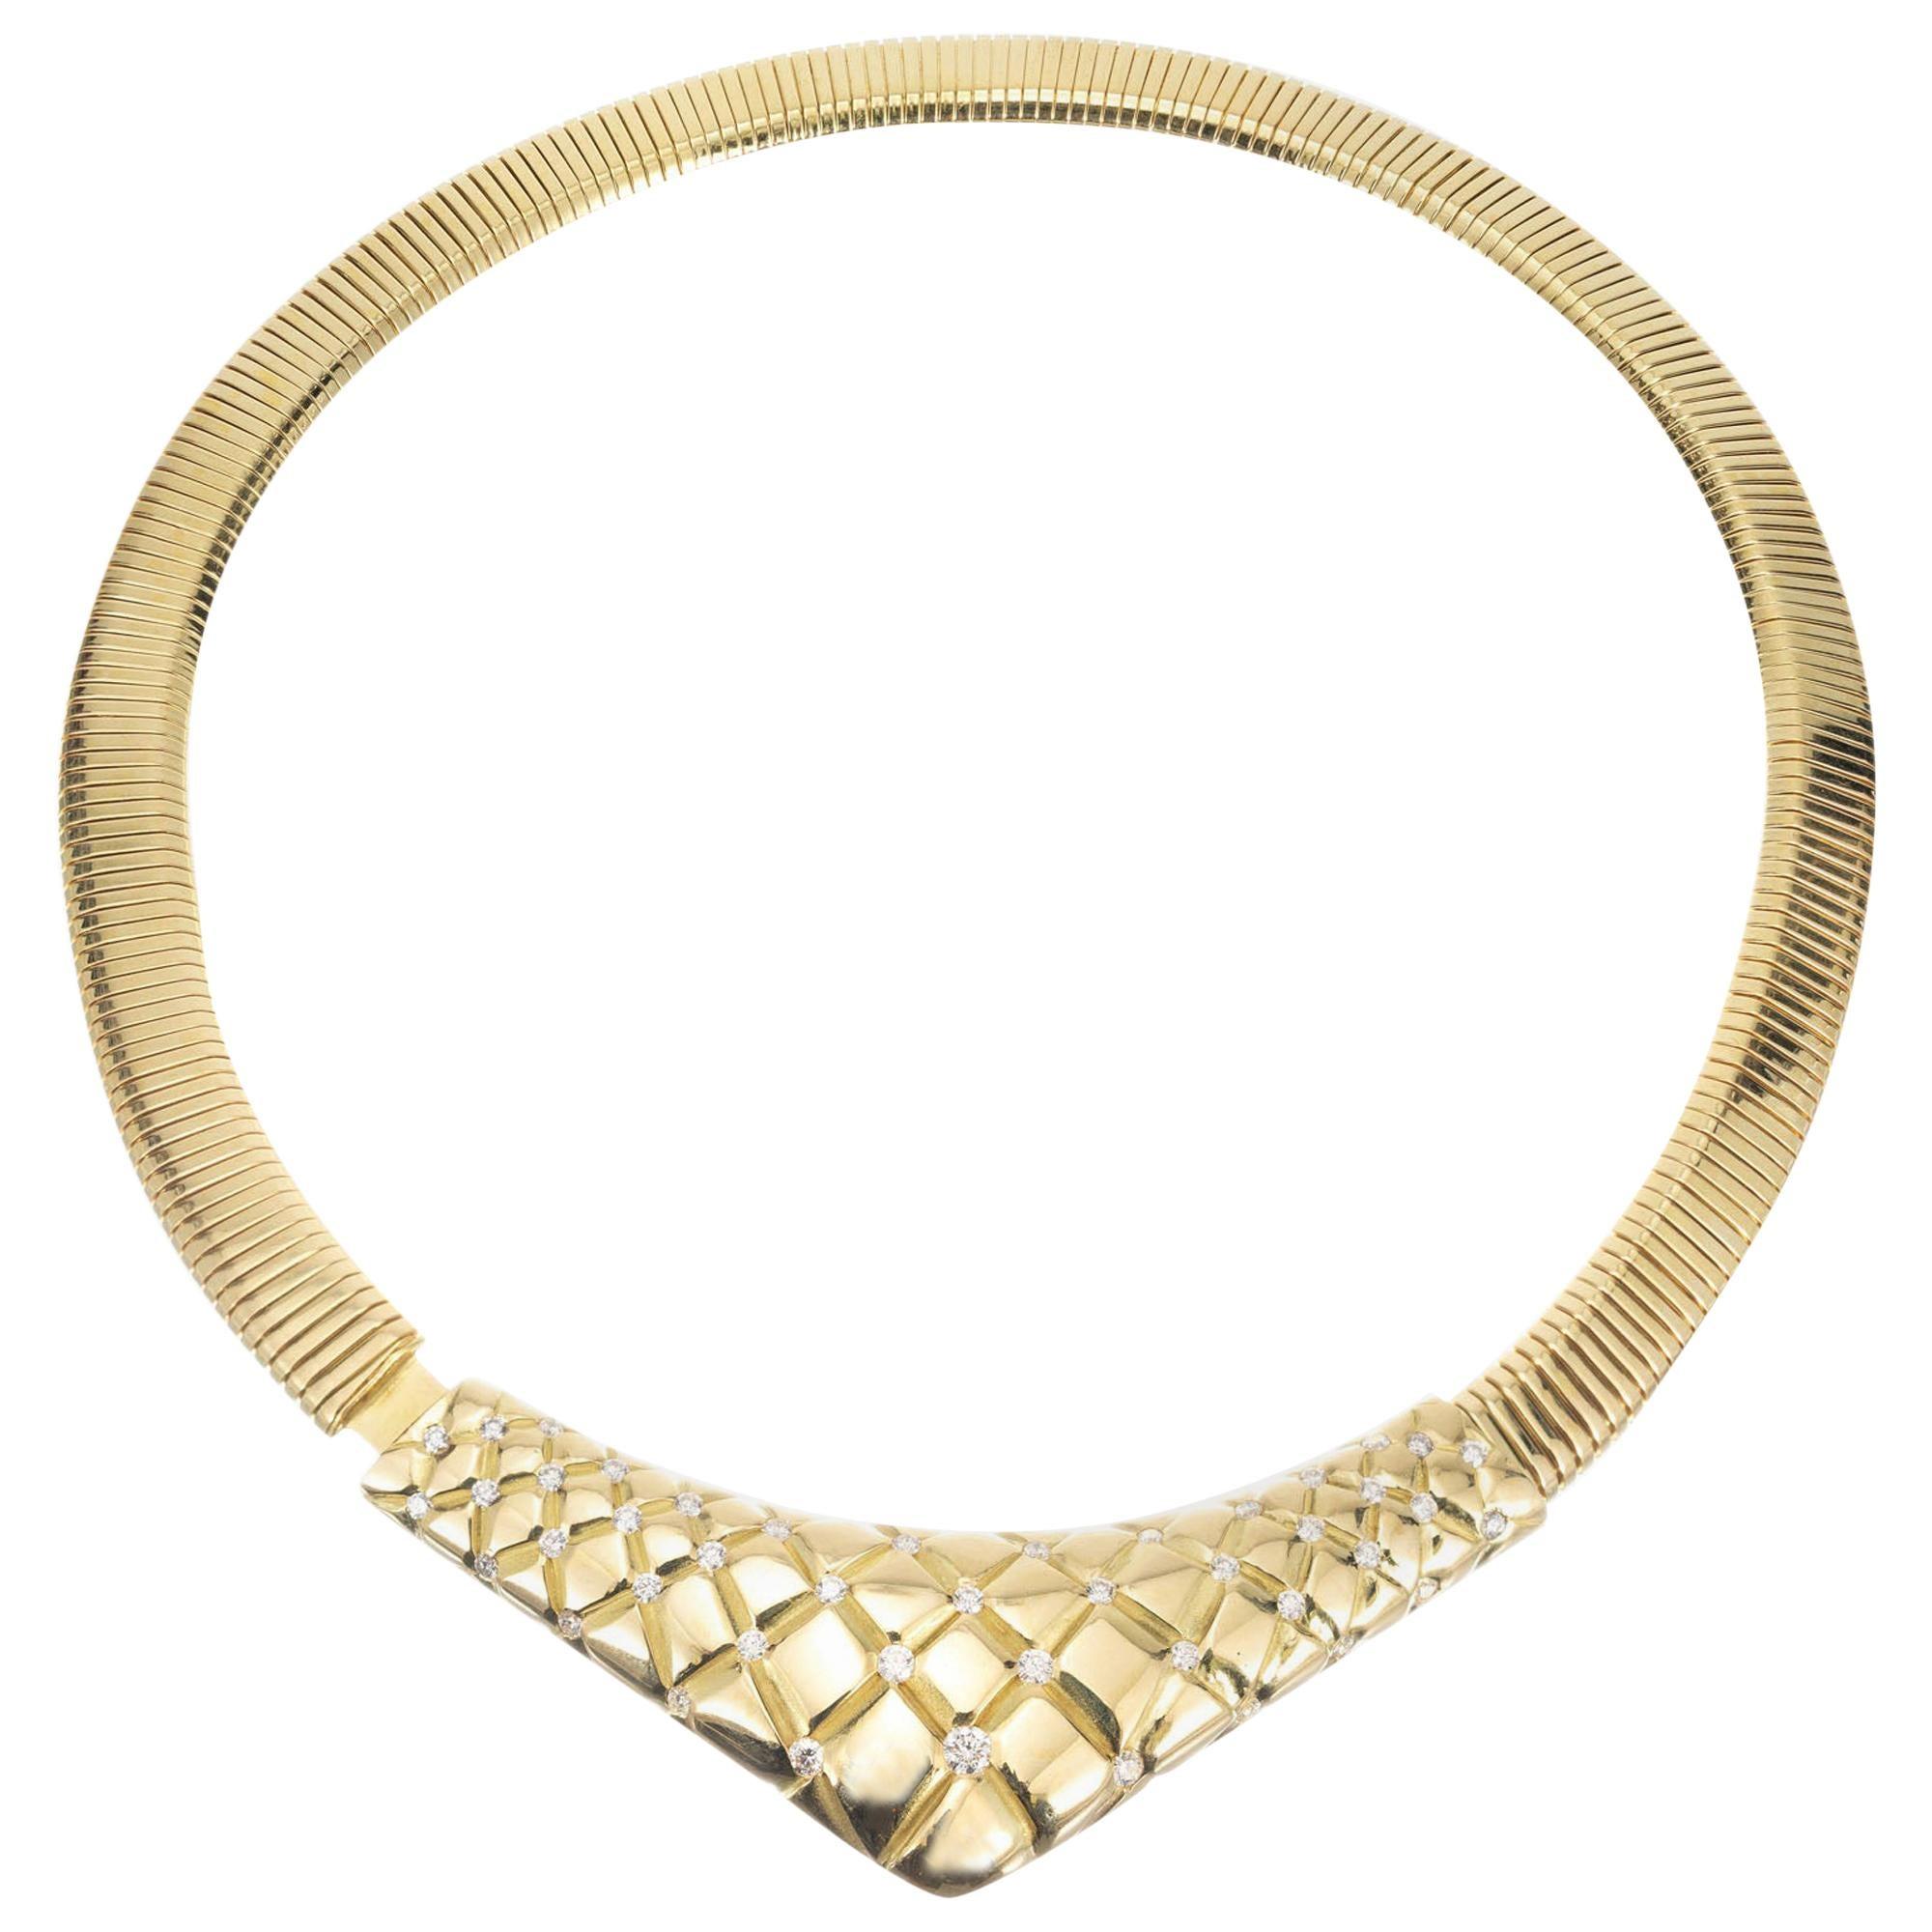 Gucci 1.45 Carat Diamond Yellow Gold Accordion Necklace